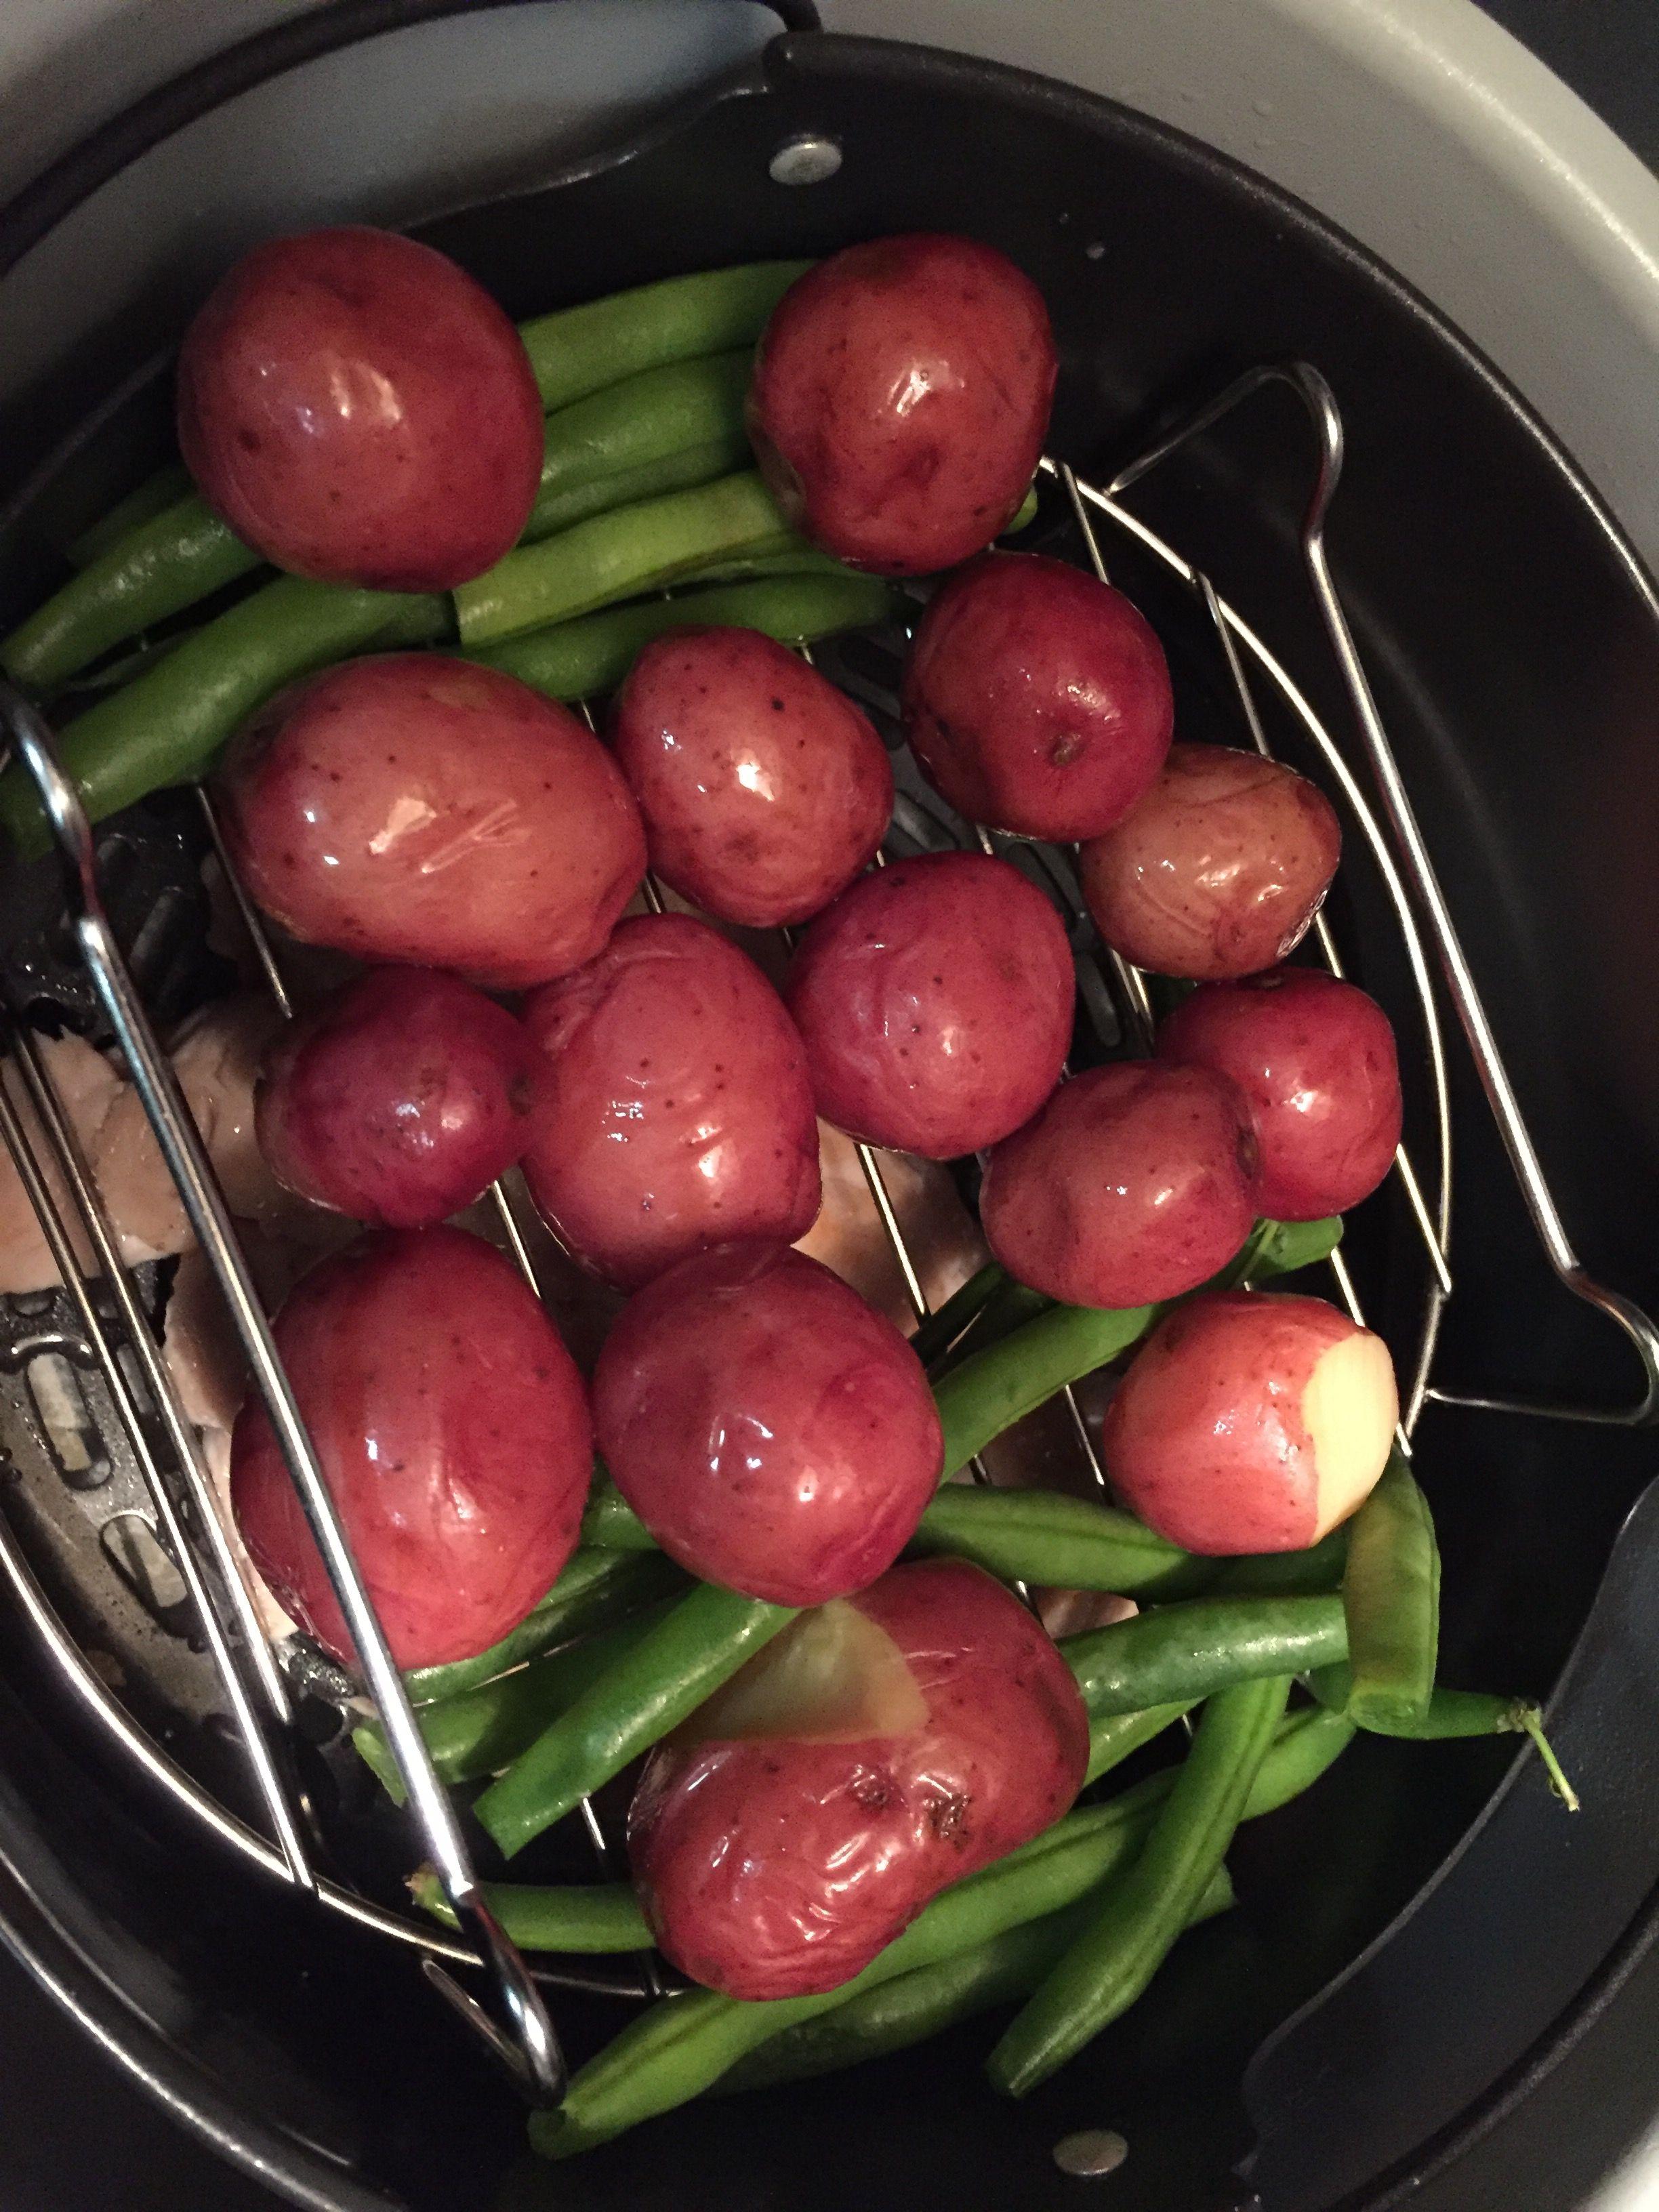 Baby Red Potatoes Turkey Beans Gravy In Ninja Foodi